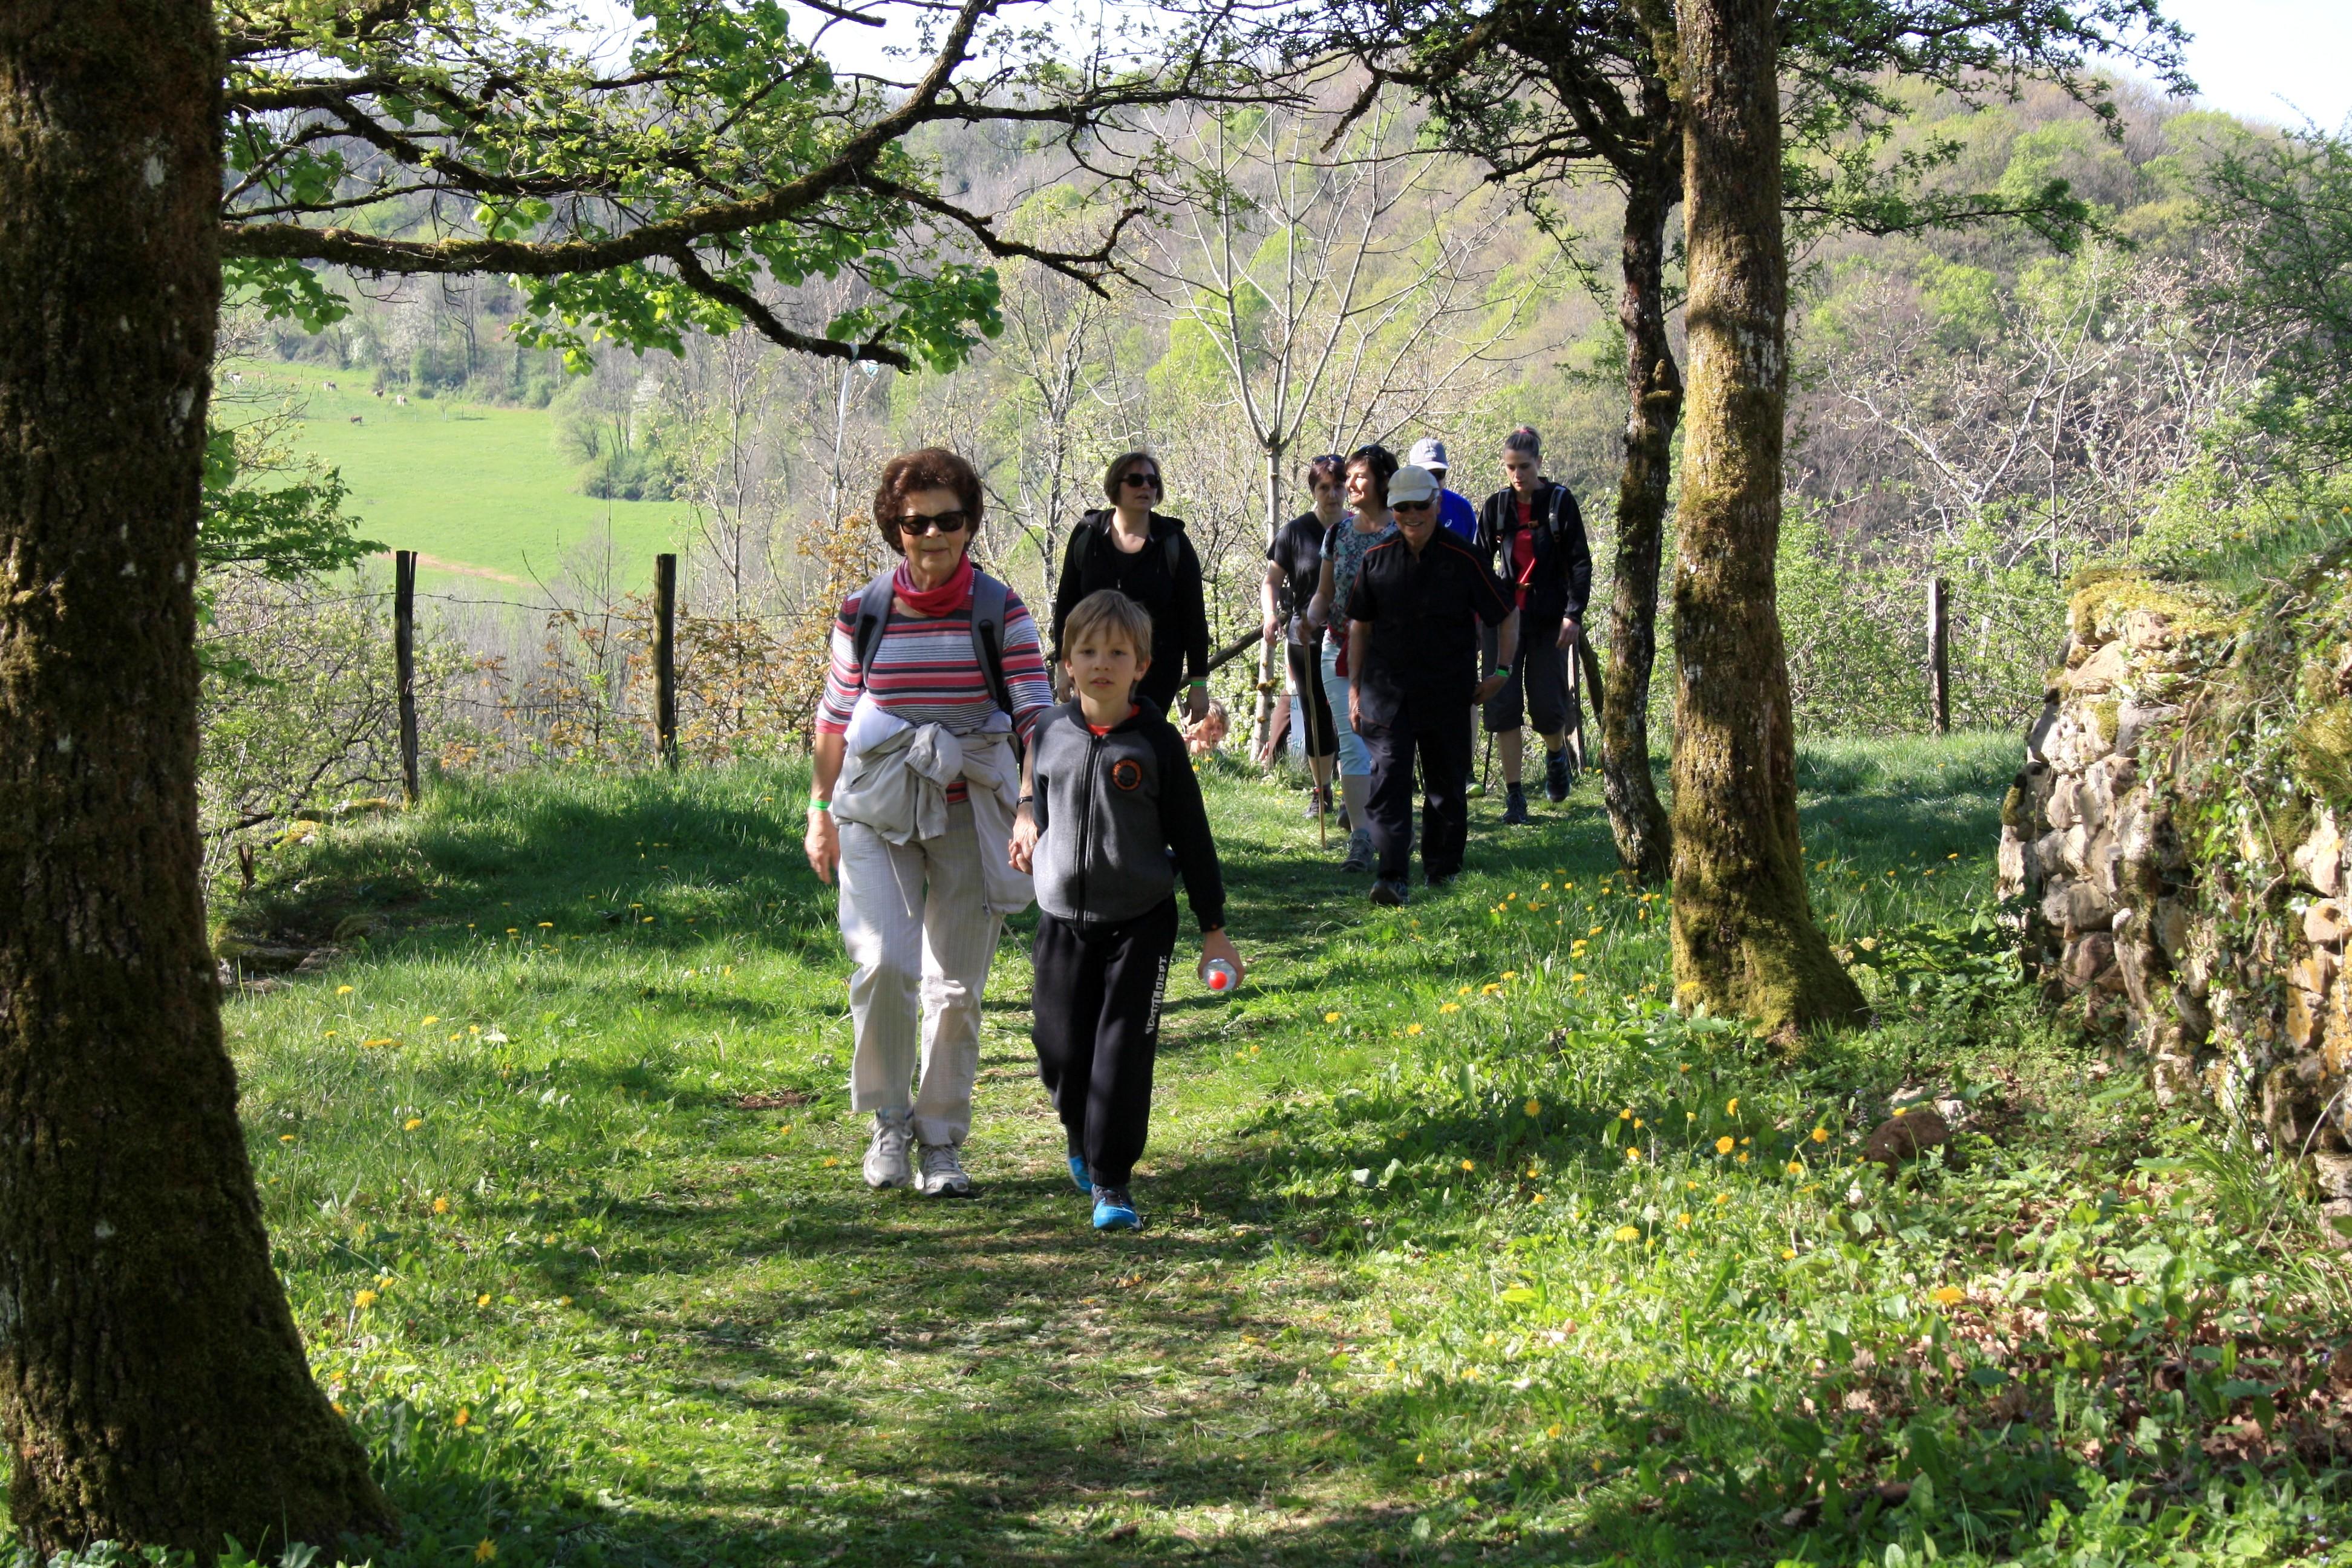 2017-04-09 - Trail-Montfaucon (213)